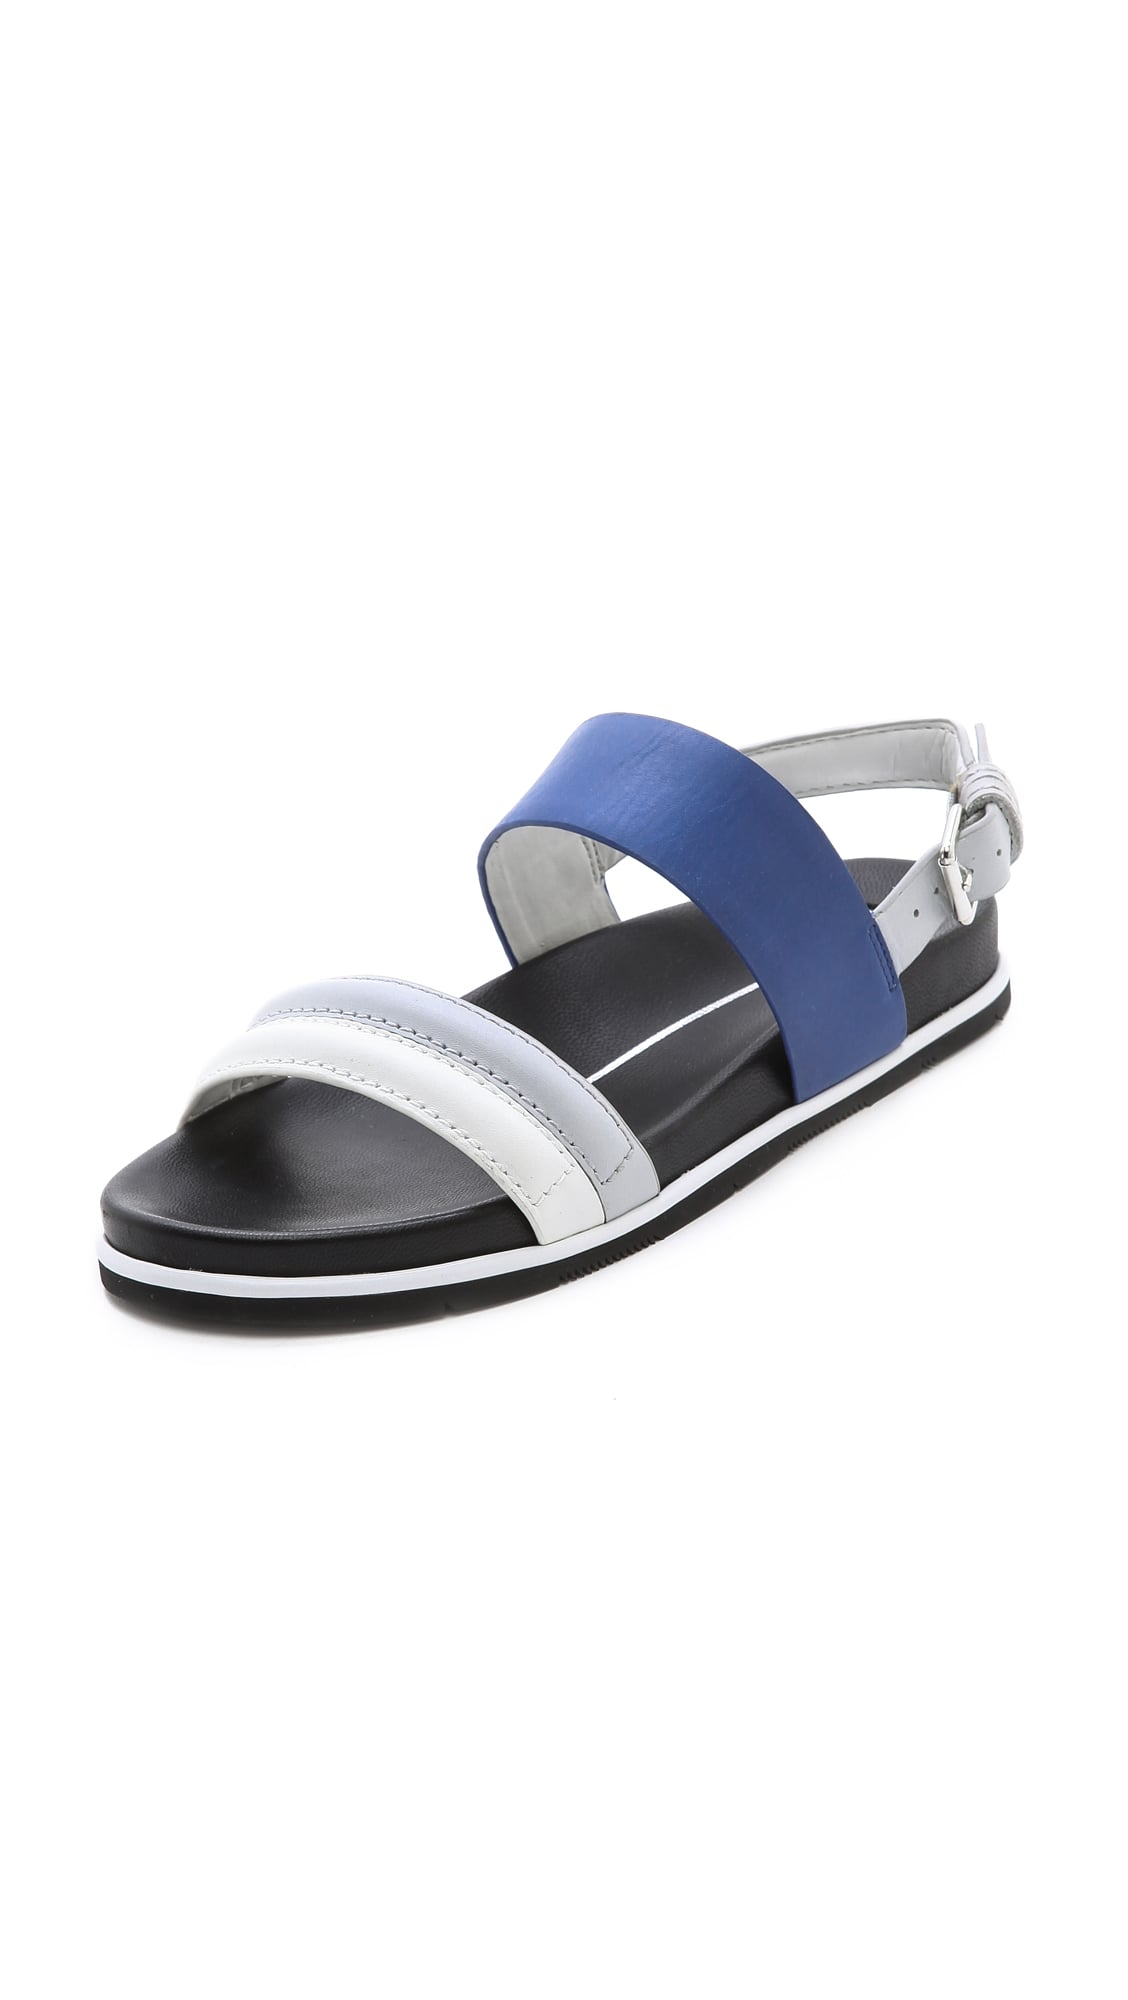 Dolce Vita Colorblock Sandals